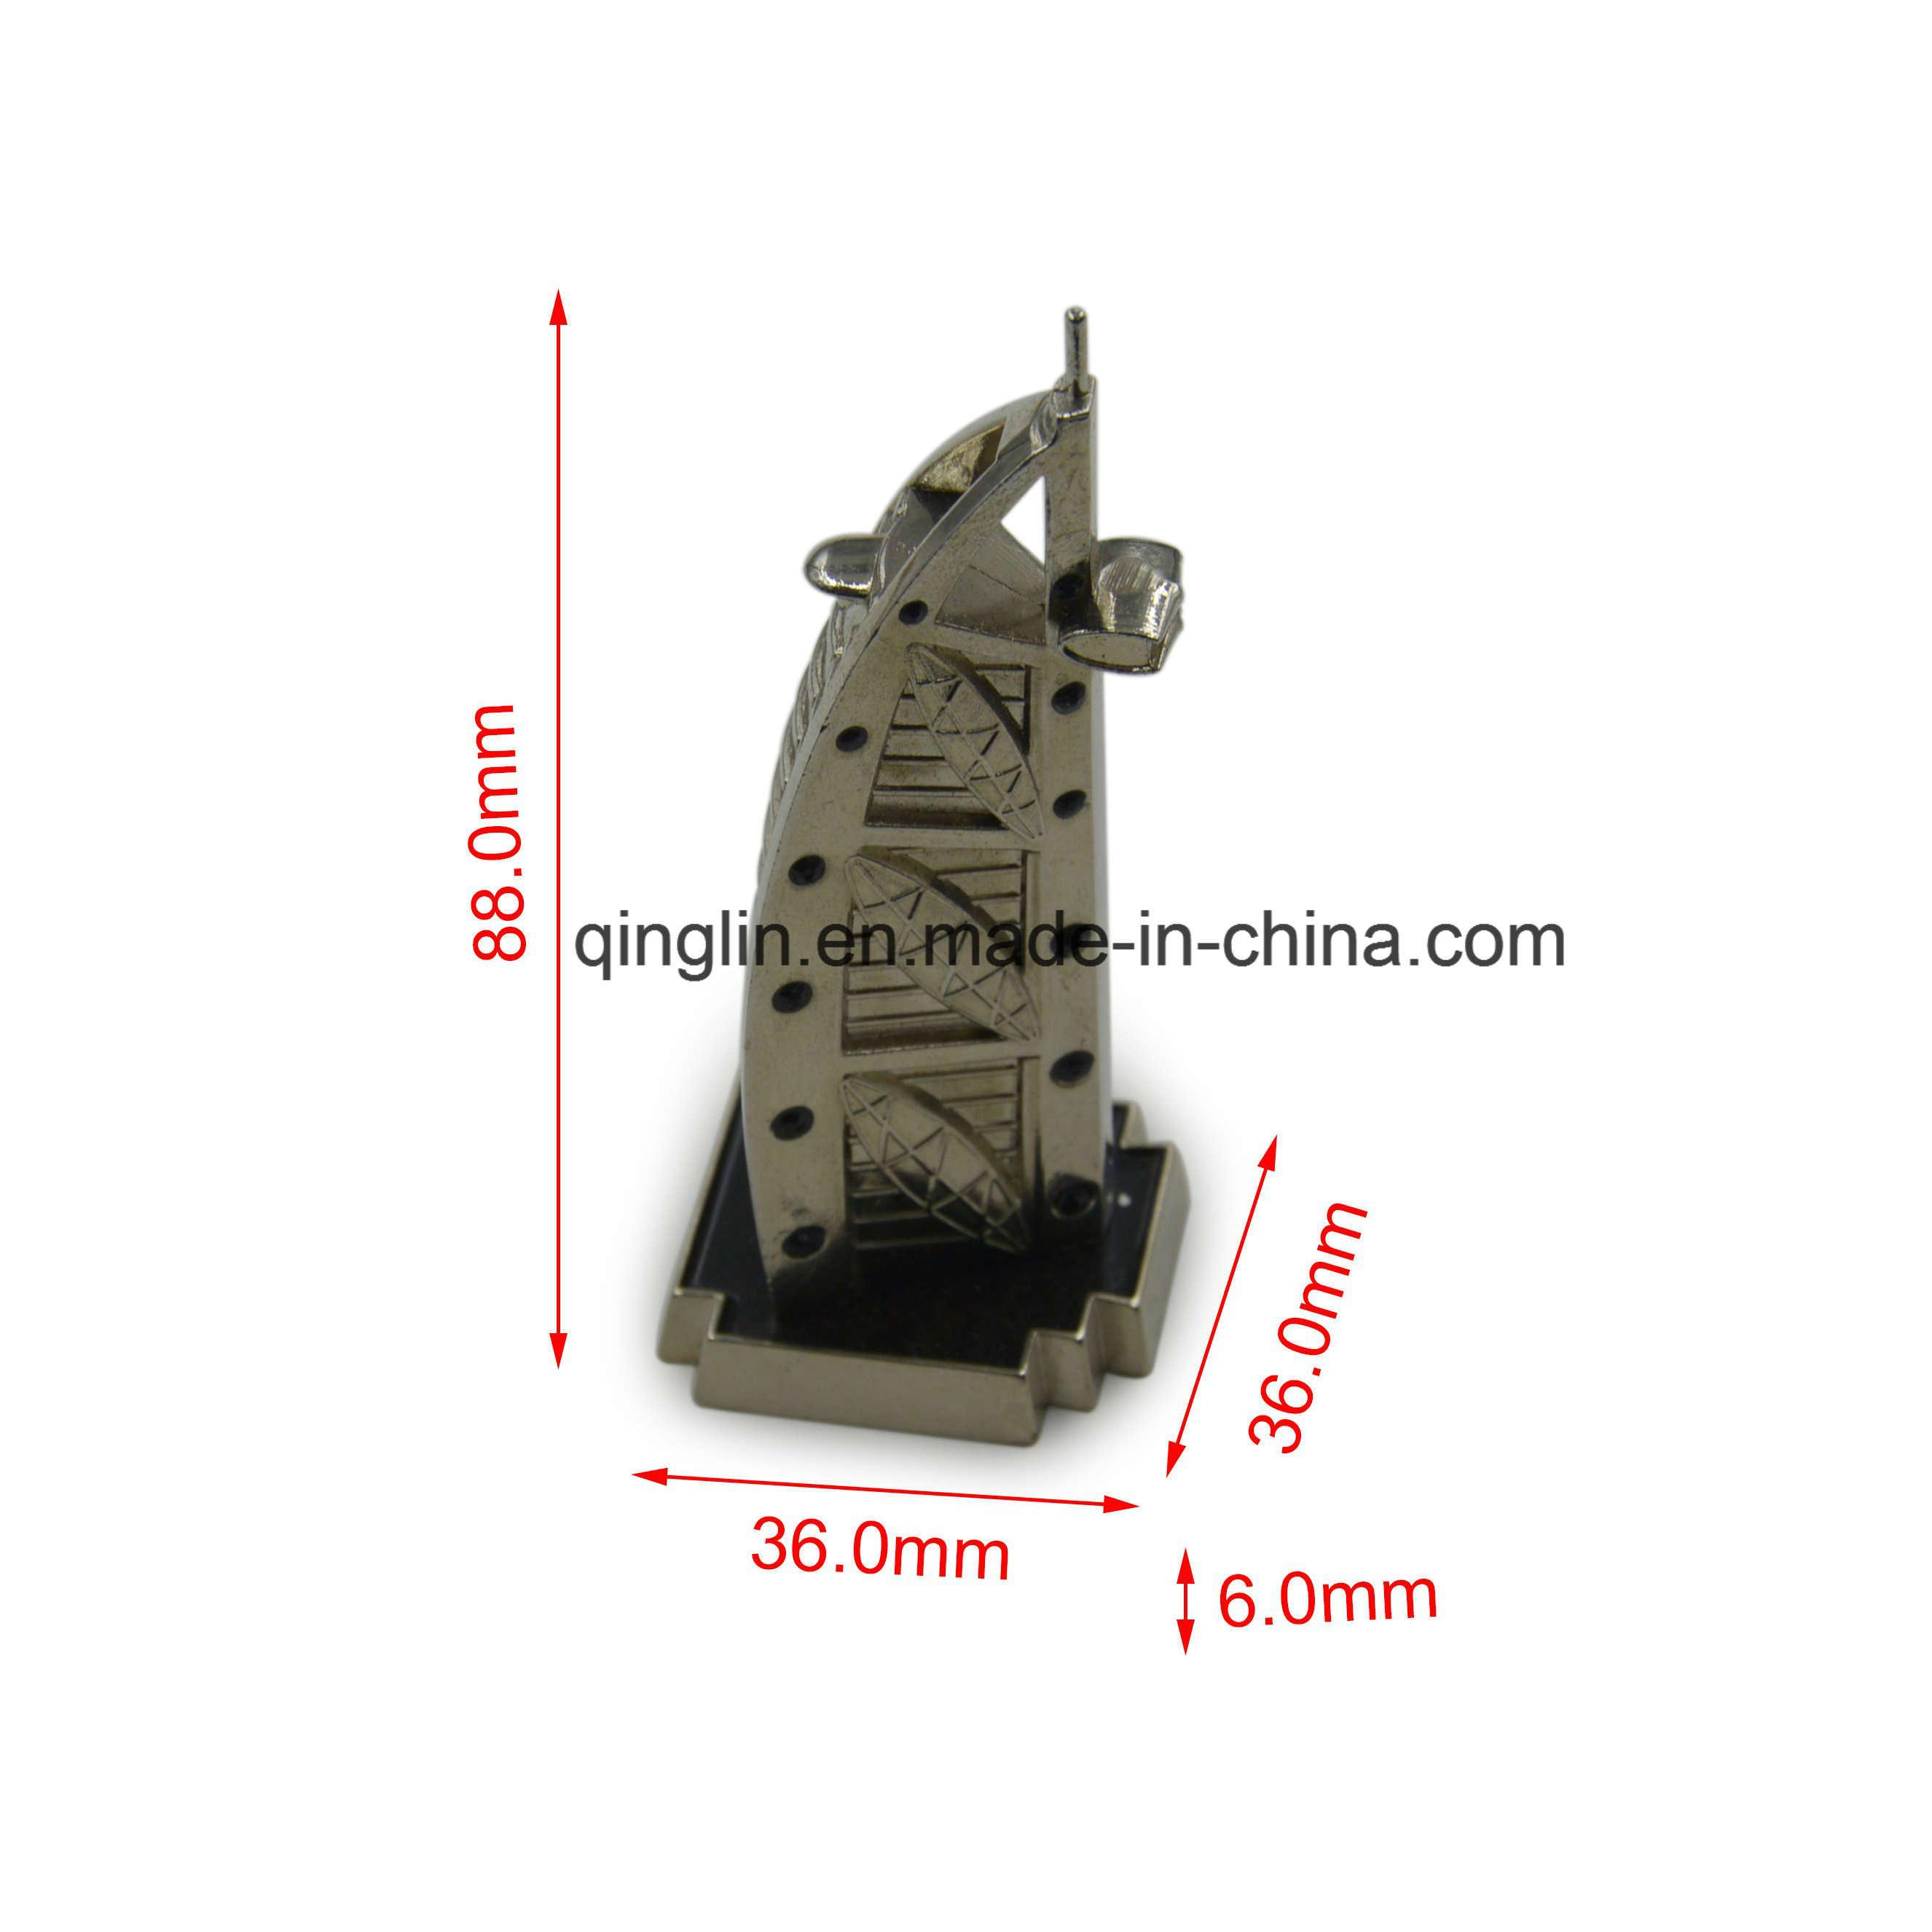 Promotional Custom Metal Tourist Model Souvenir